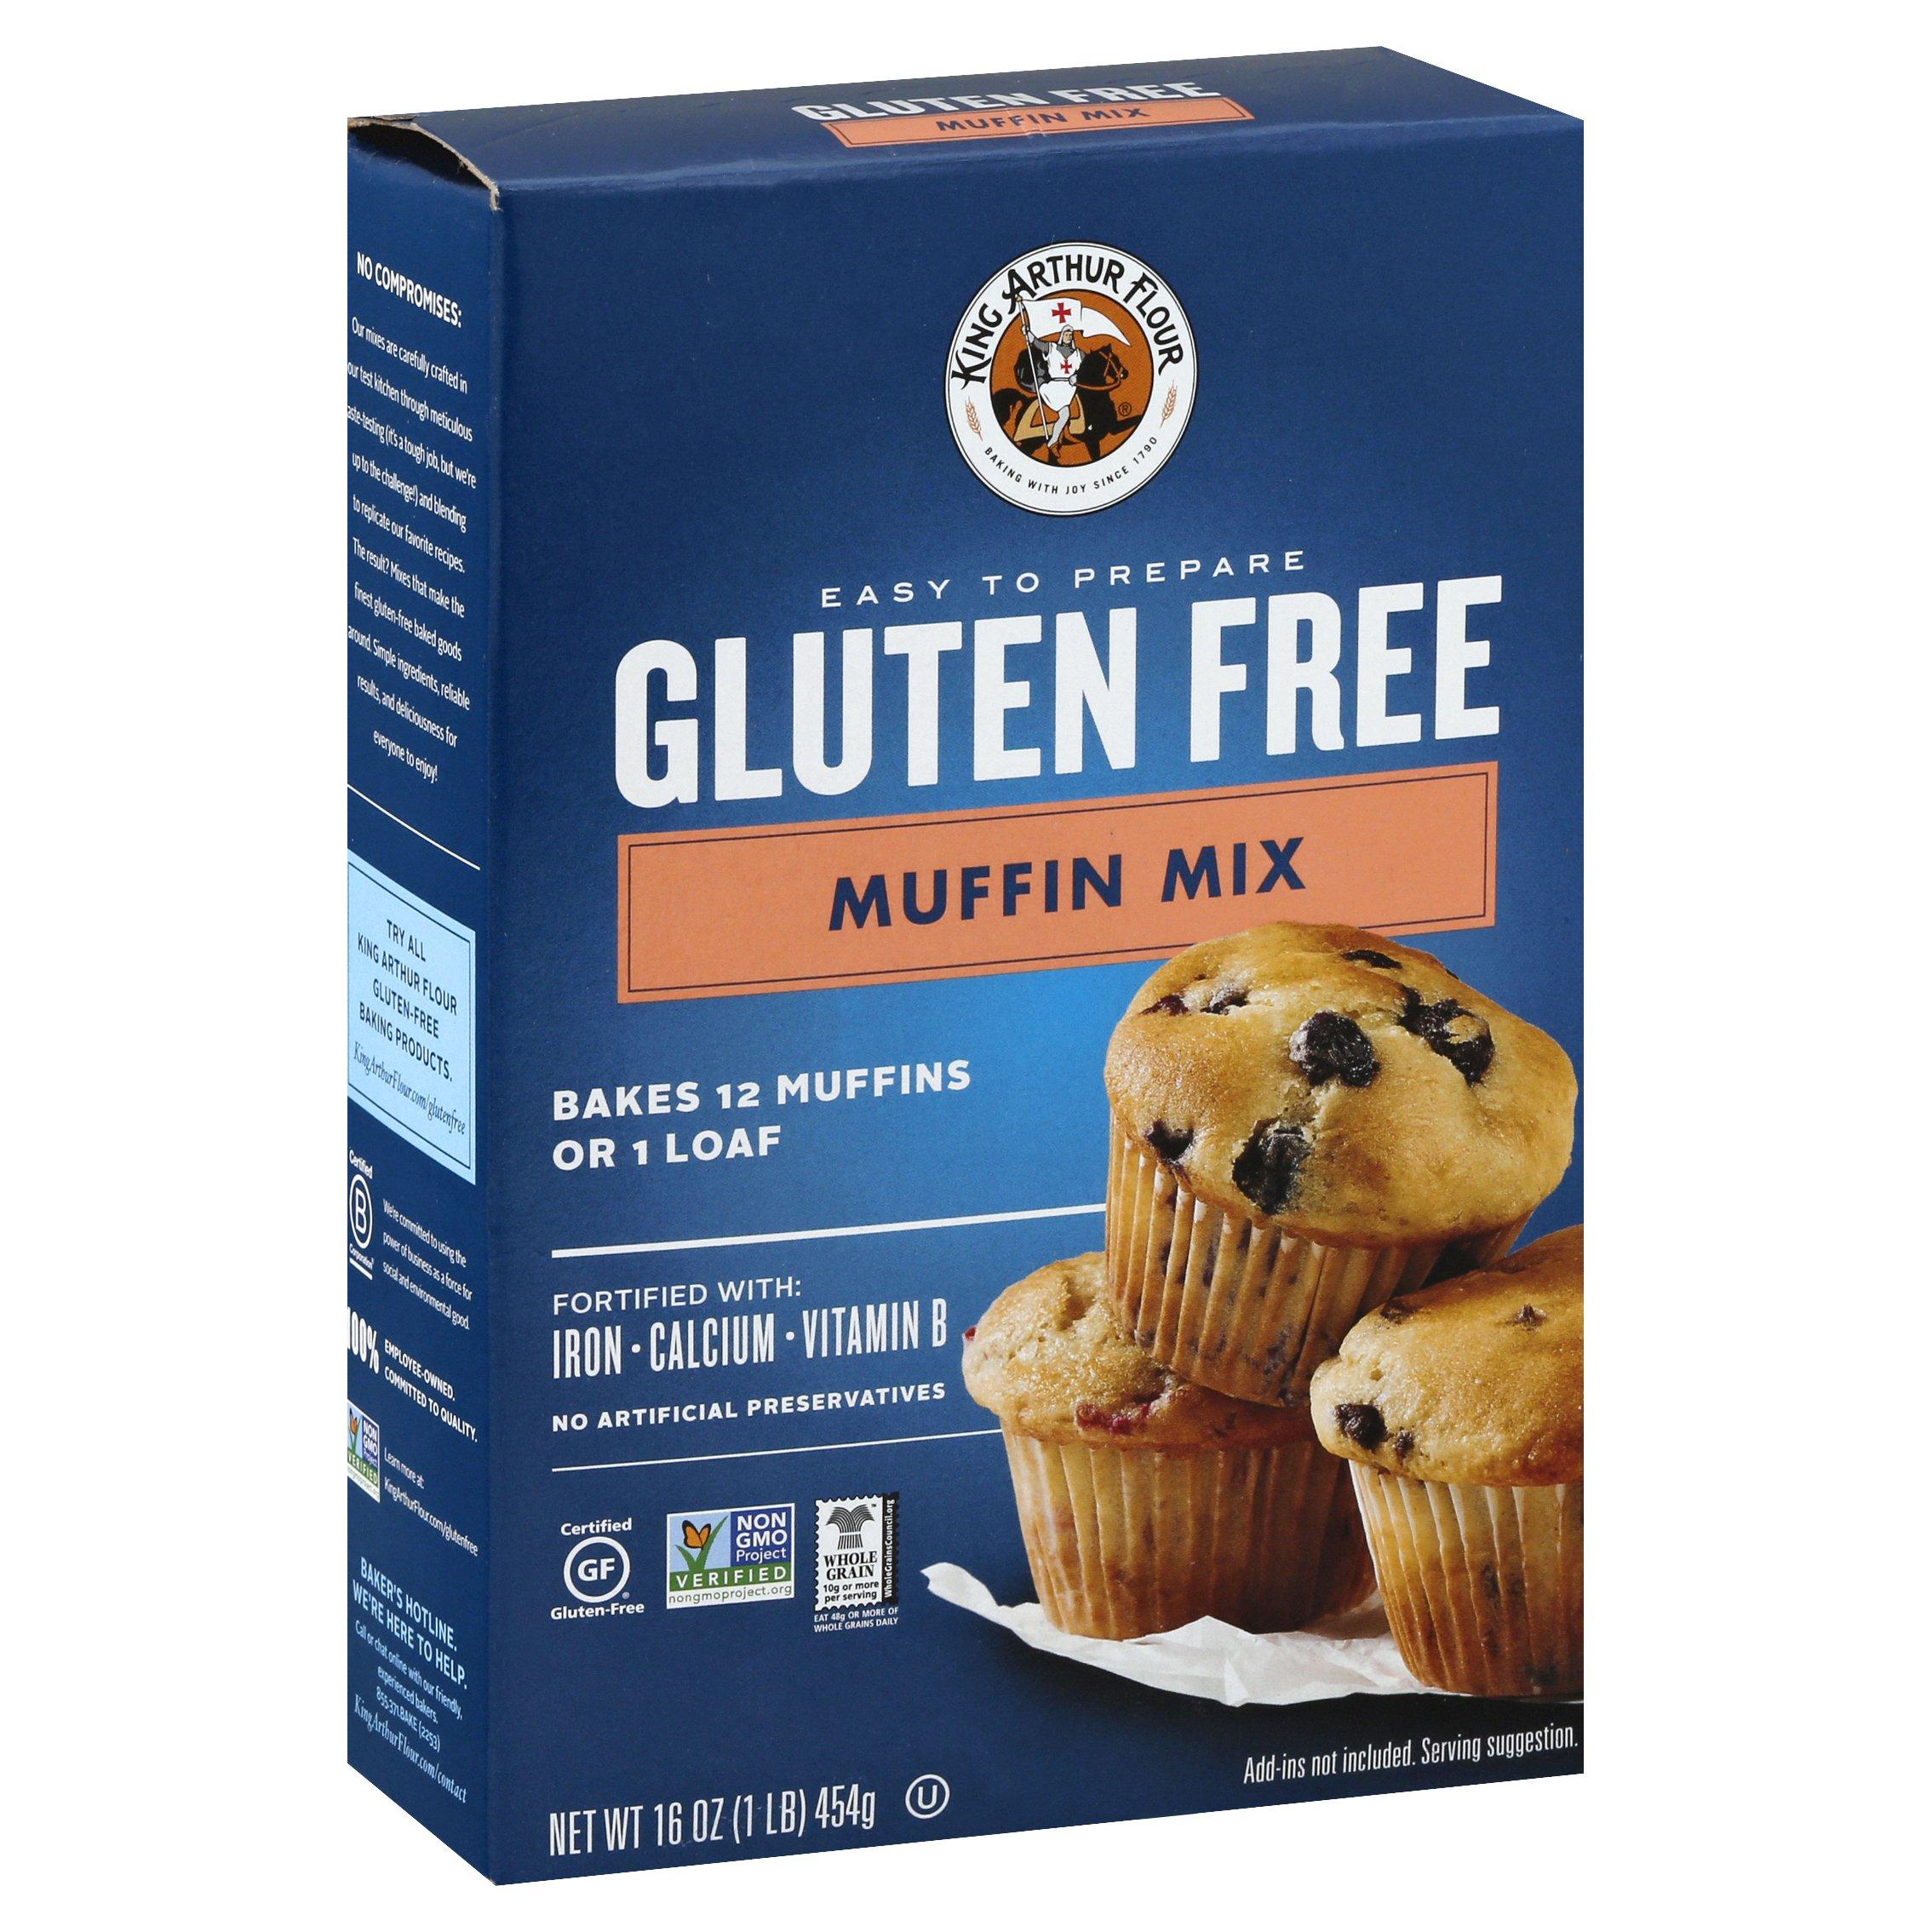 King Arthur Gluten Free Muffin Mix 16OZ 6-Pack